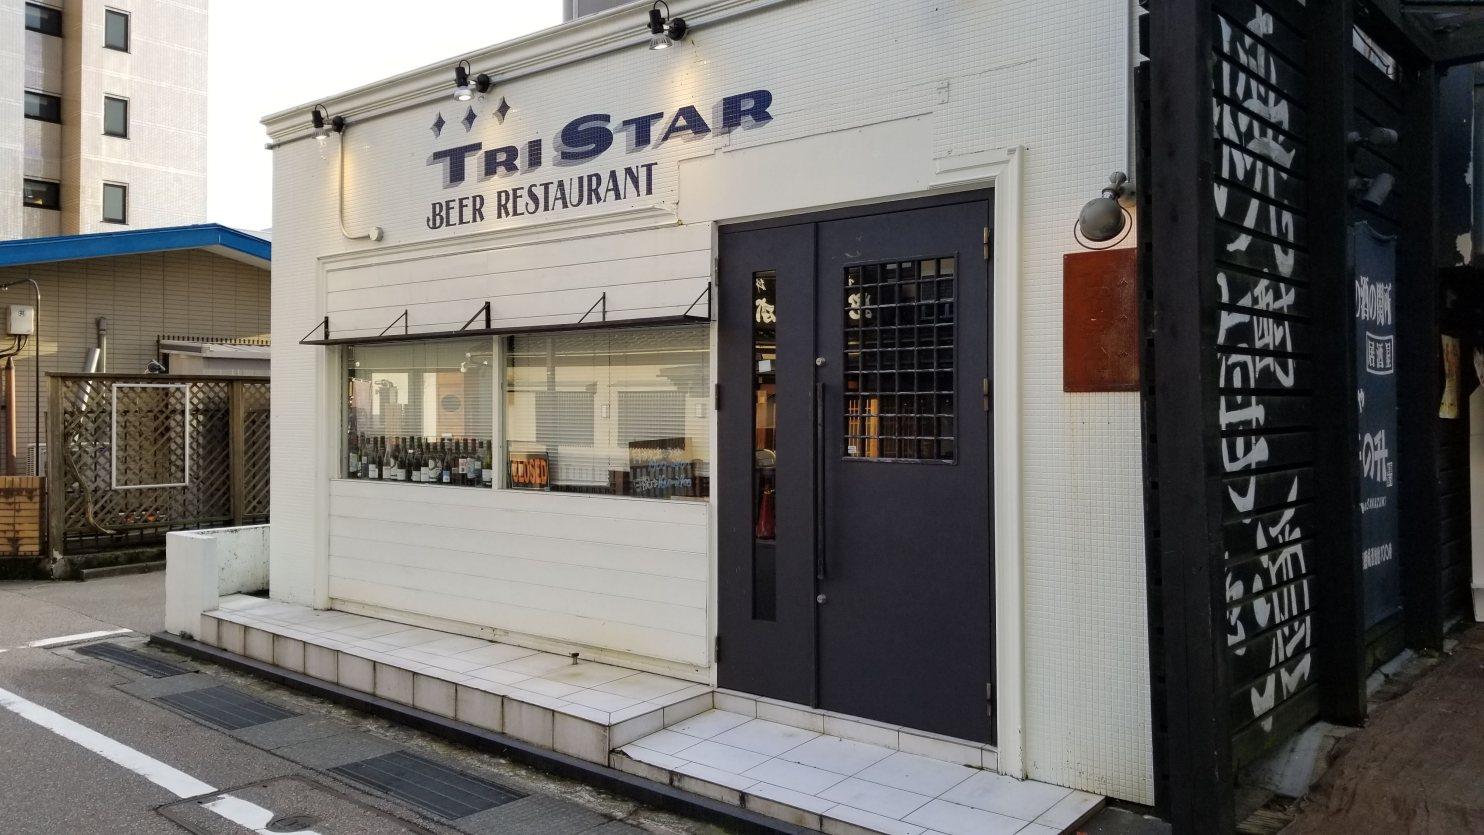 Tri Star Beer Restaurant Front・トライスタービアレストラン前